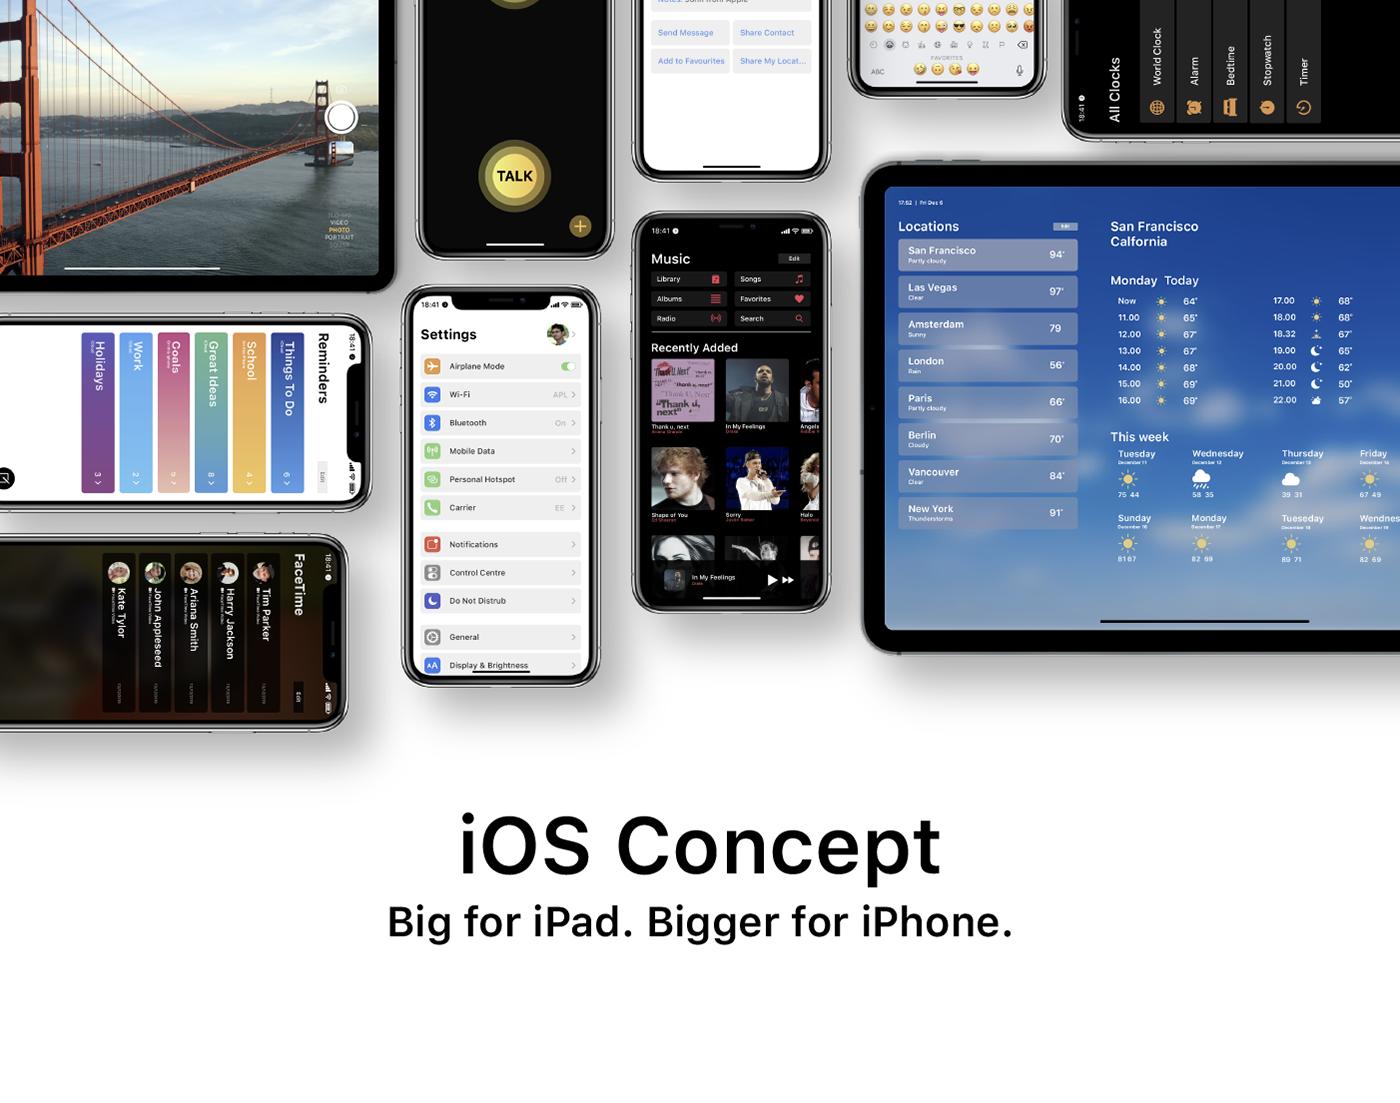 apple ios concept ios concept iphone iPad ios13 macos iPadOS iOS Concept design